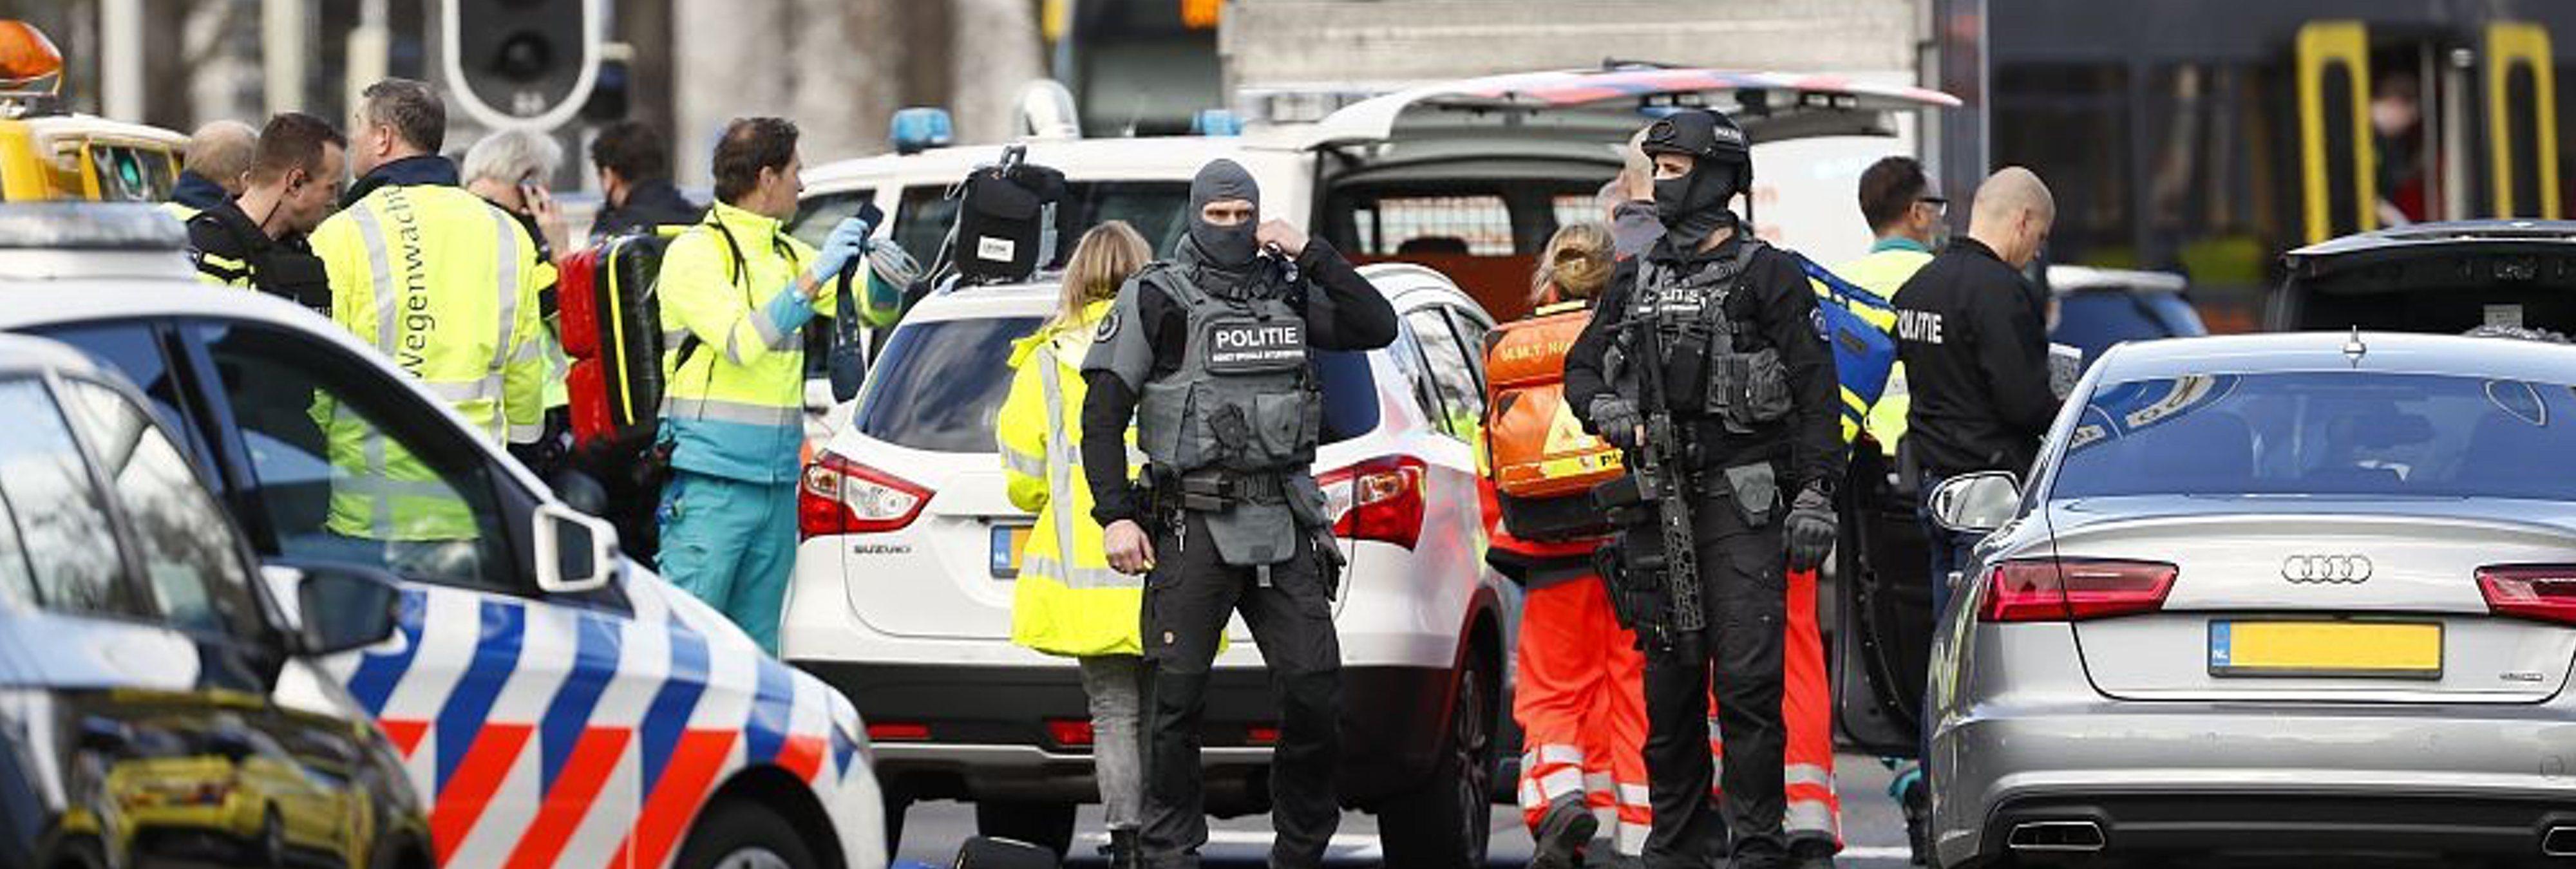 Un muerto y varios heridos en un tiroteo en Utrecht